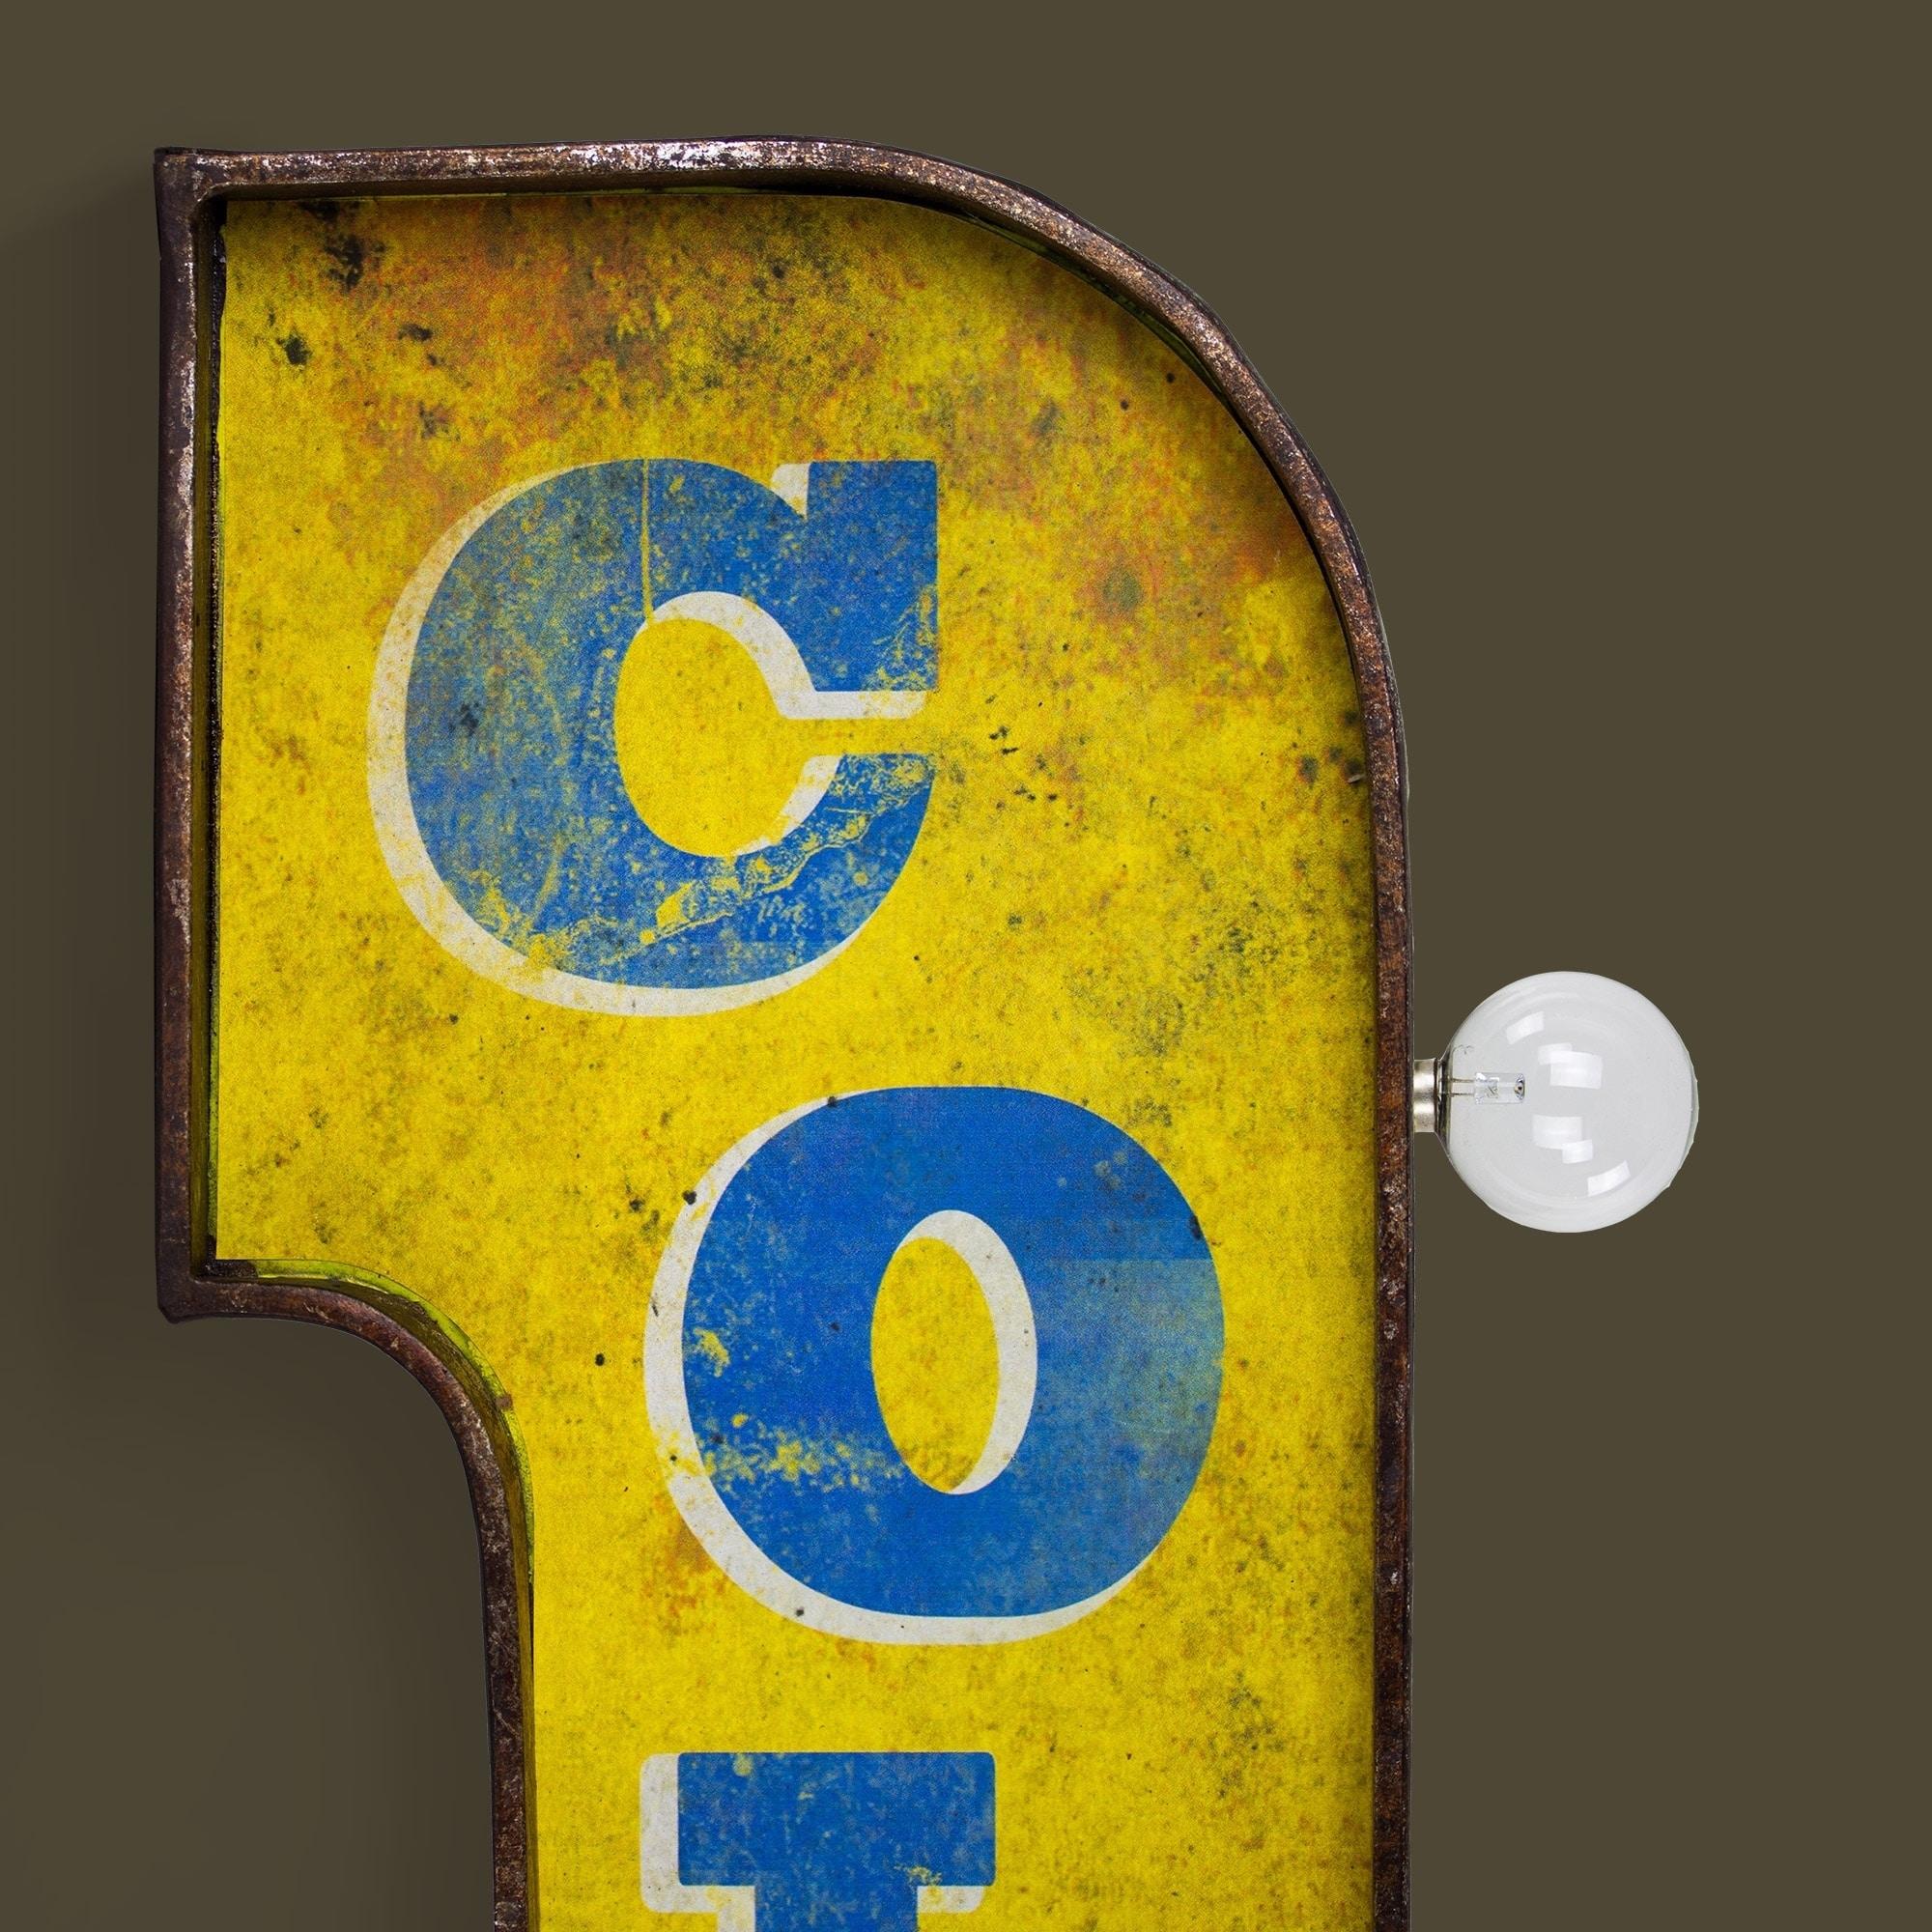 Shop Cold Beer Vintage Bar Decor Distressed Metal LED Sign Marquee ...